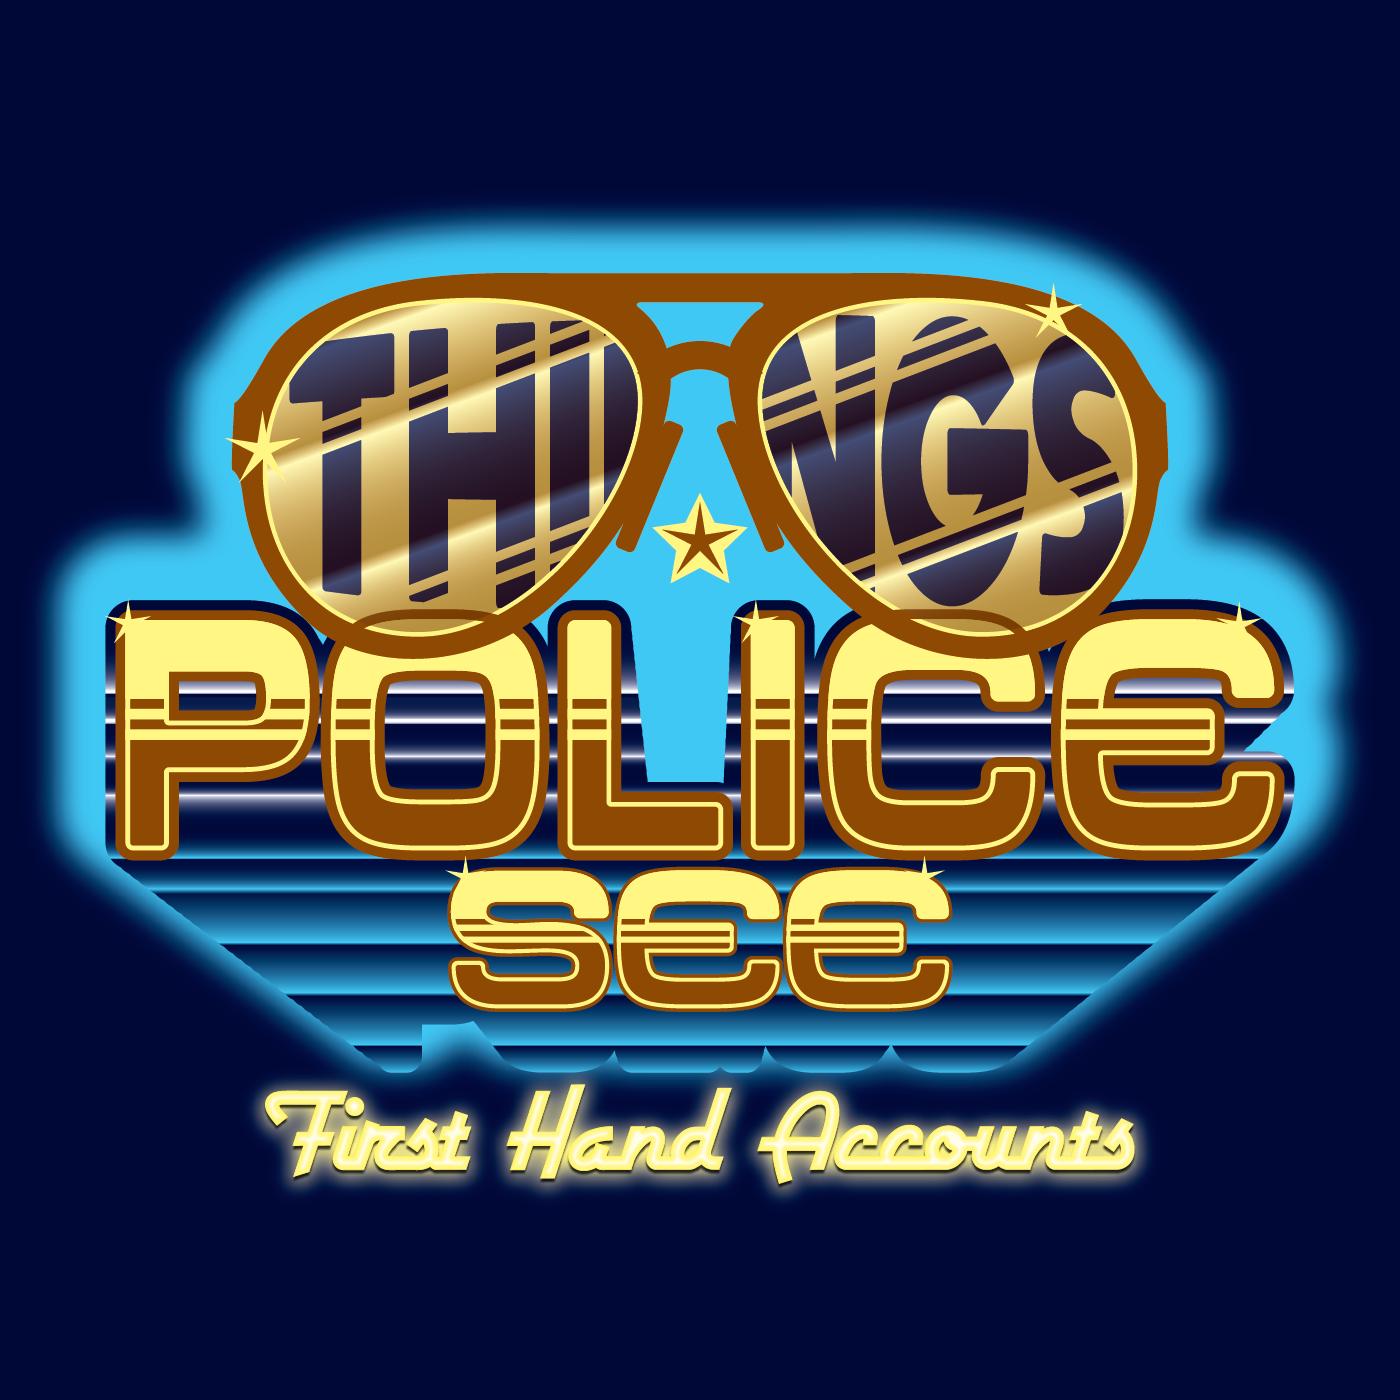 Police podcast